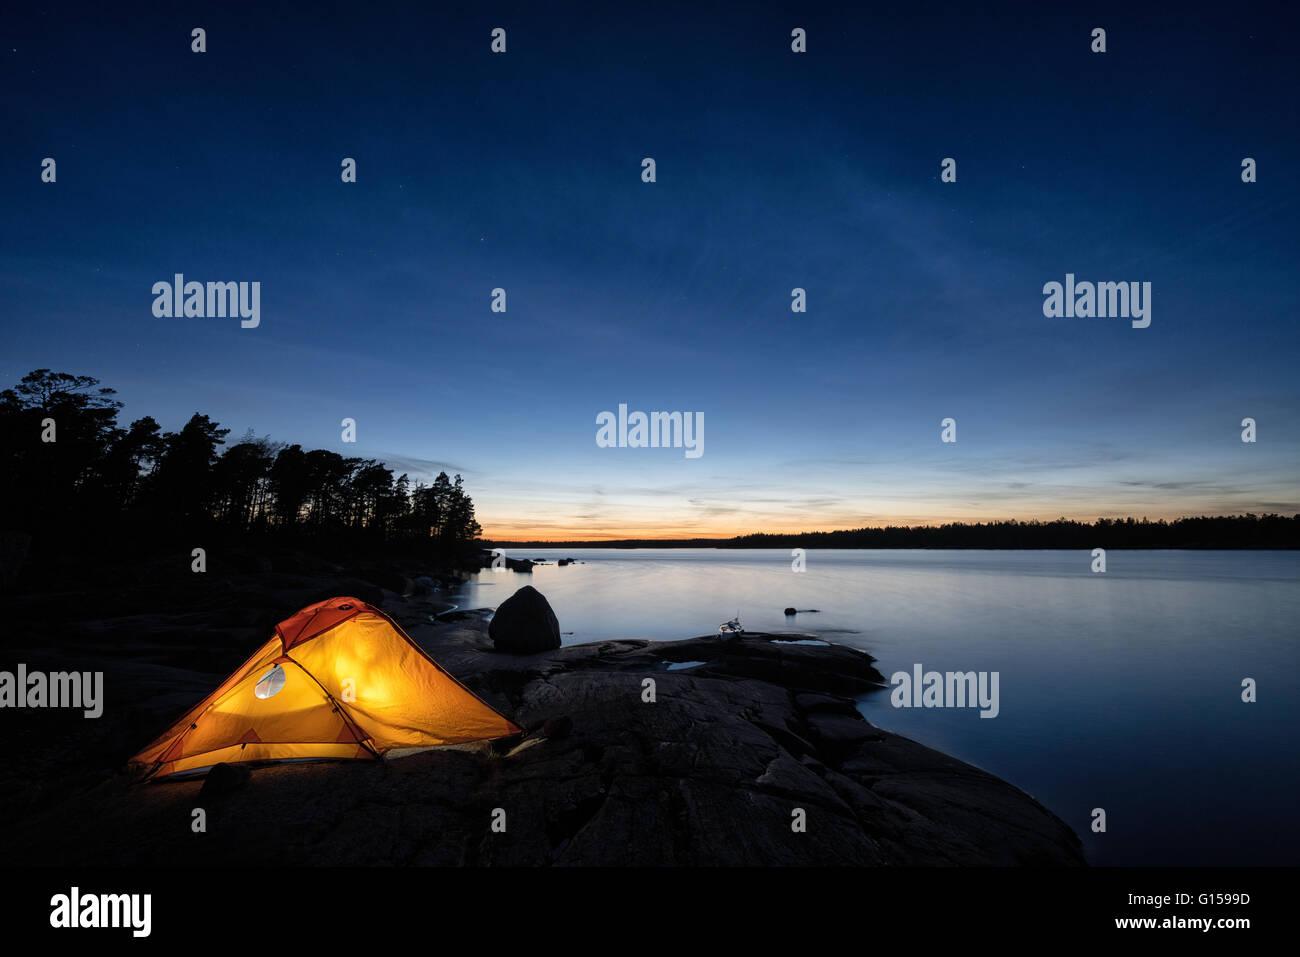 Camping at Tallholmen island, Loviisa, Finland, Europe, EU - Stock Image